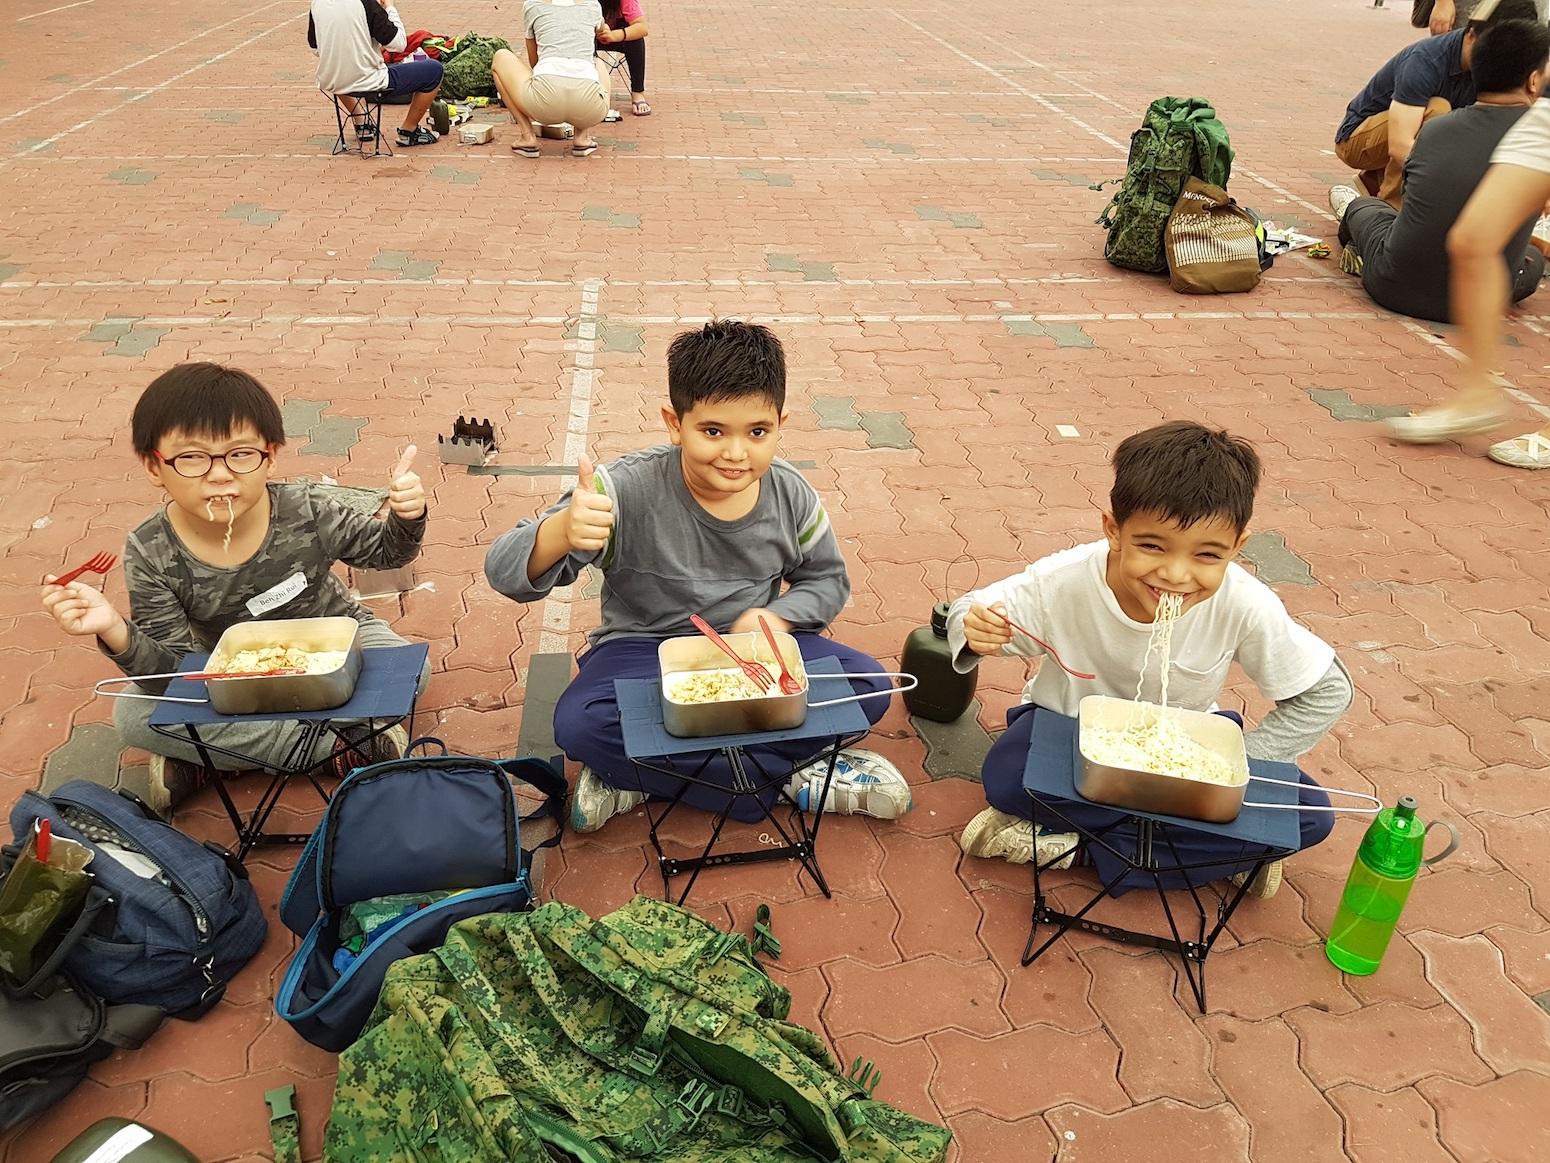 Children's Season Singapore 2017: 5 activities to keep your kids entertained - Alvinology